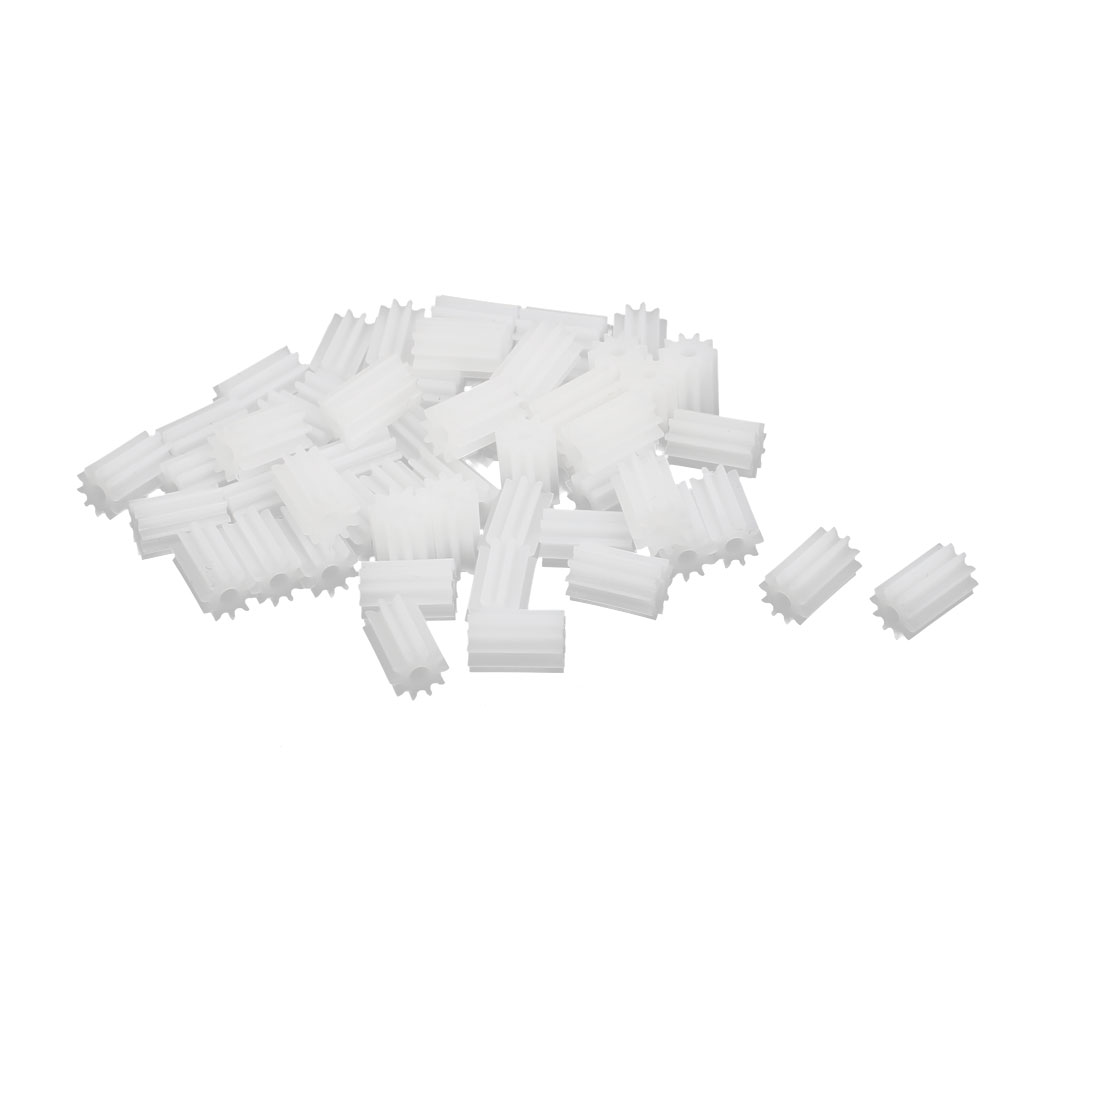 50pcs 10 Teeth 6mm Dia Plastic Gear Wheel for Car Motor Shaft